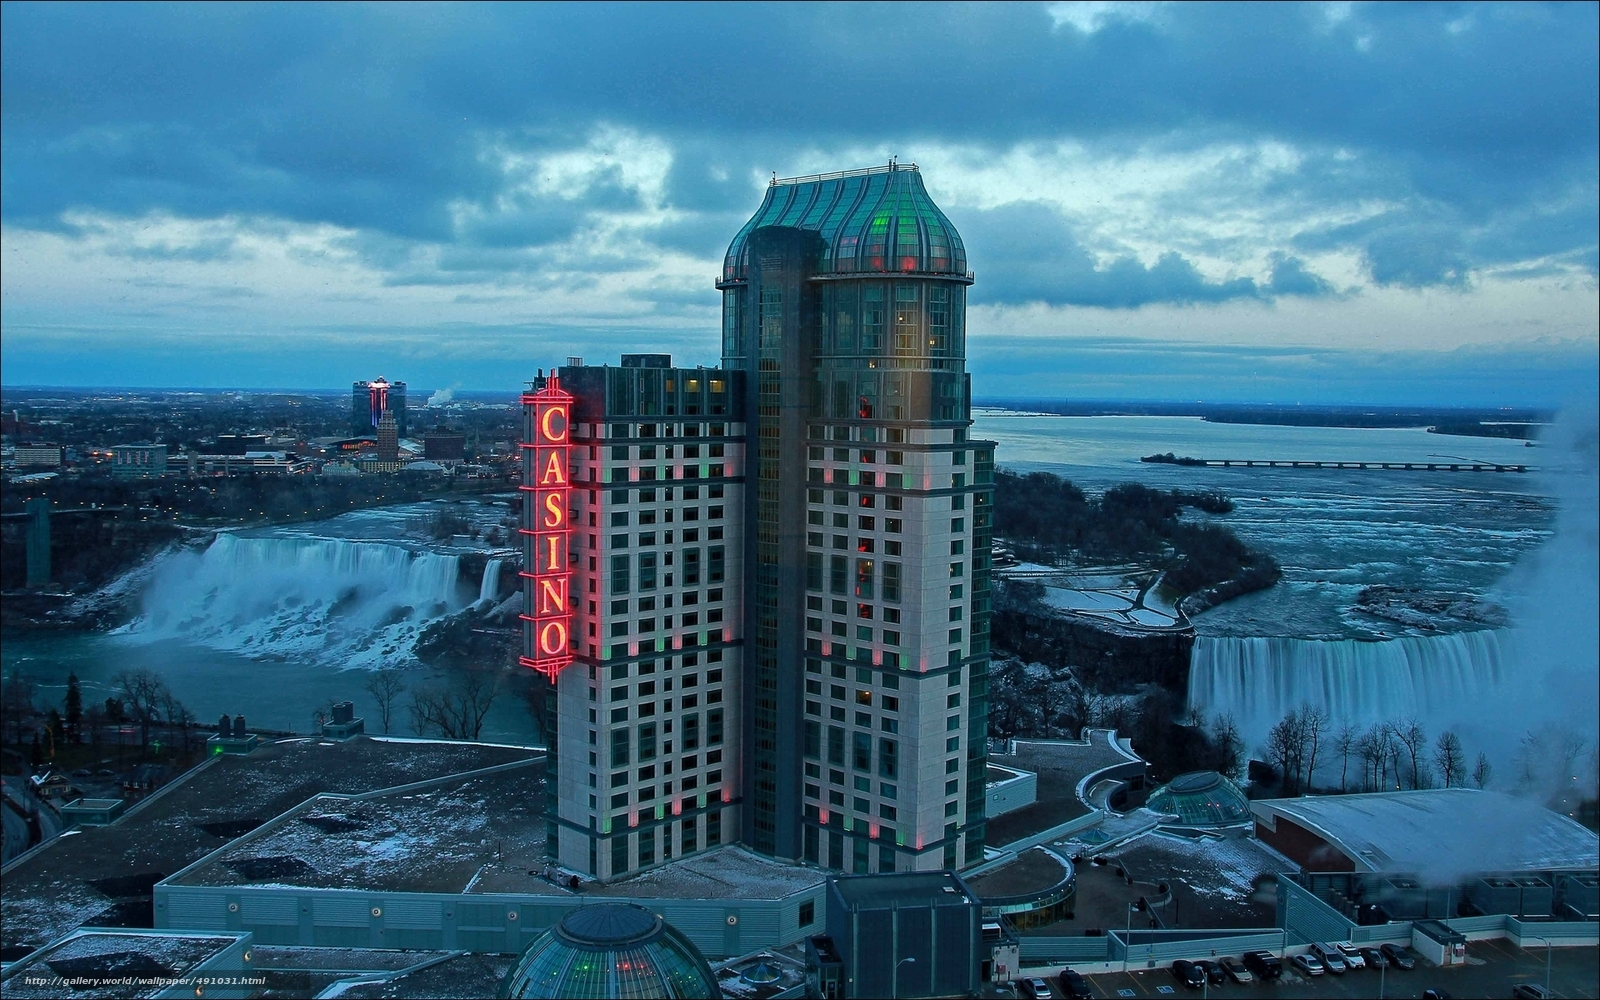 Comfort Inn Fallsview Hotel Niagara Falls  Welcome